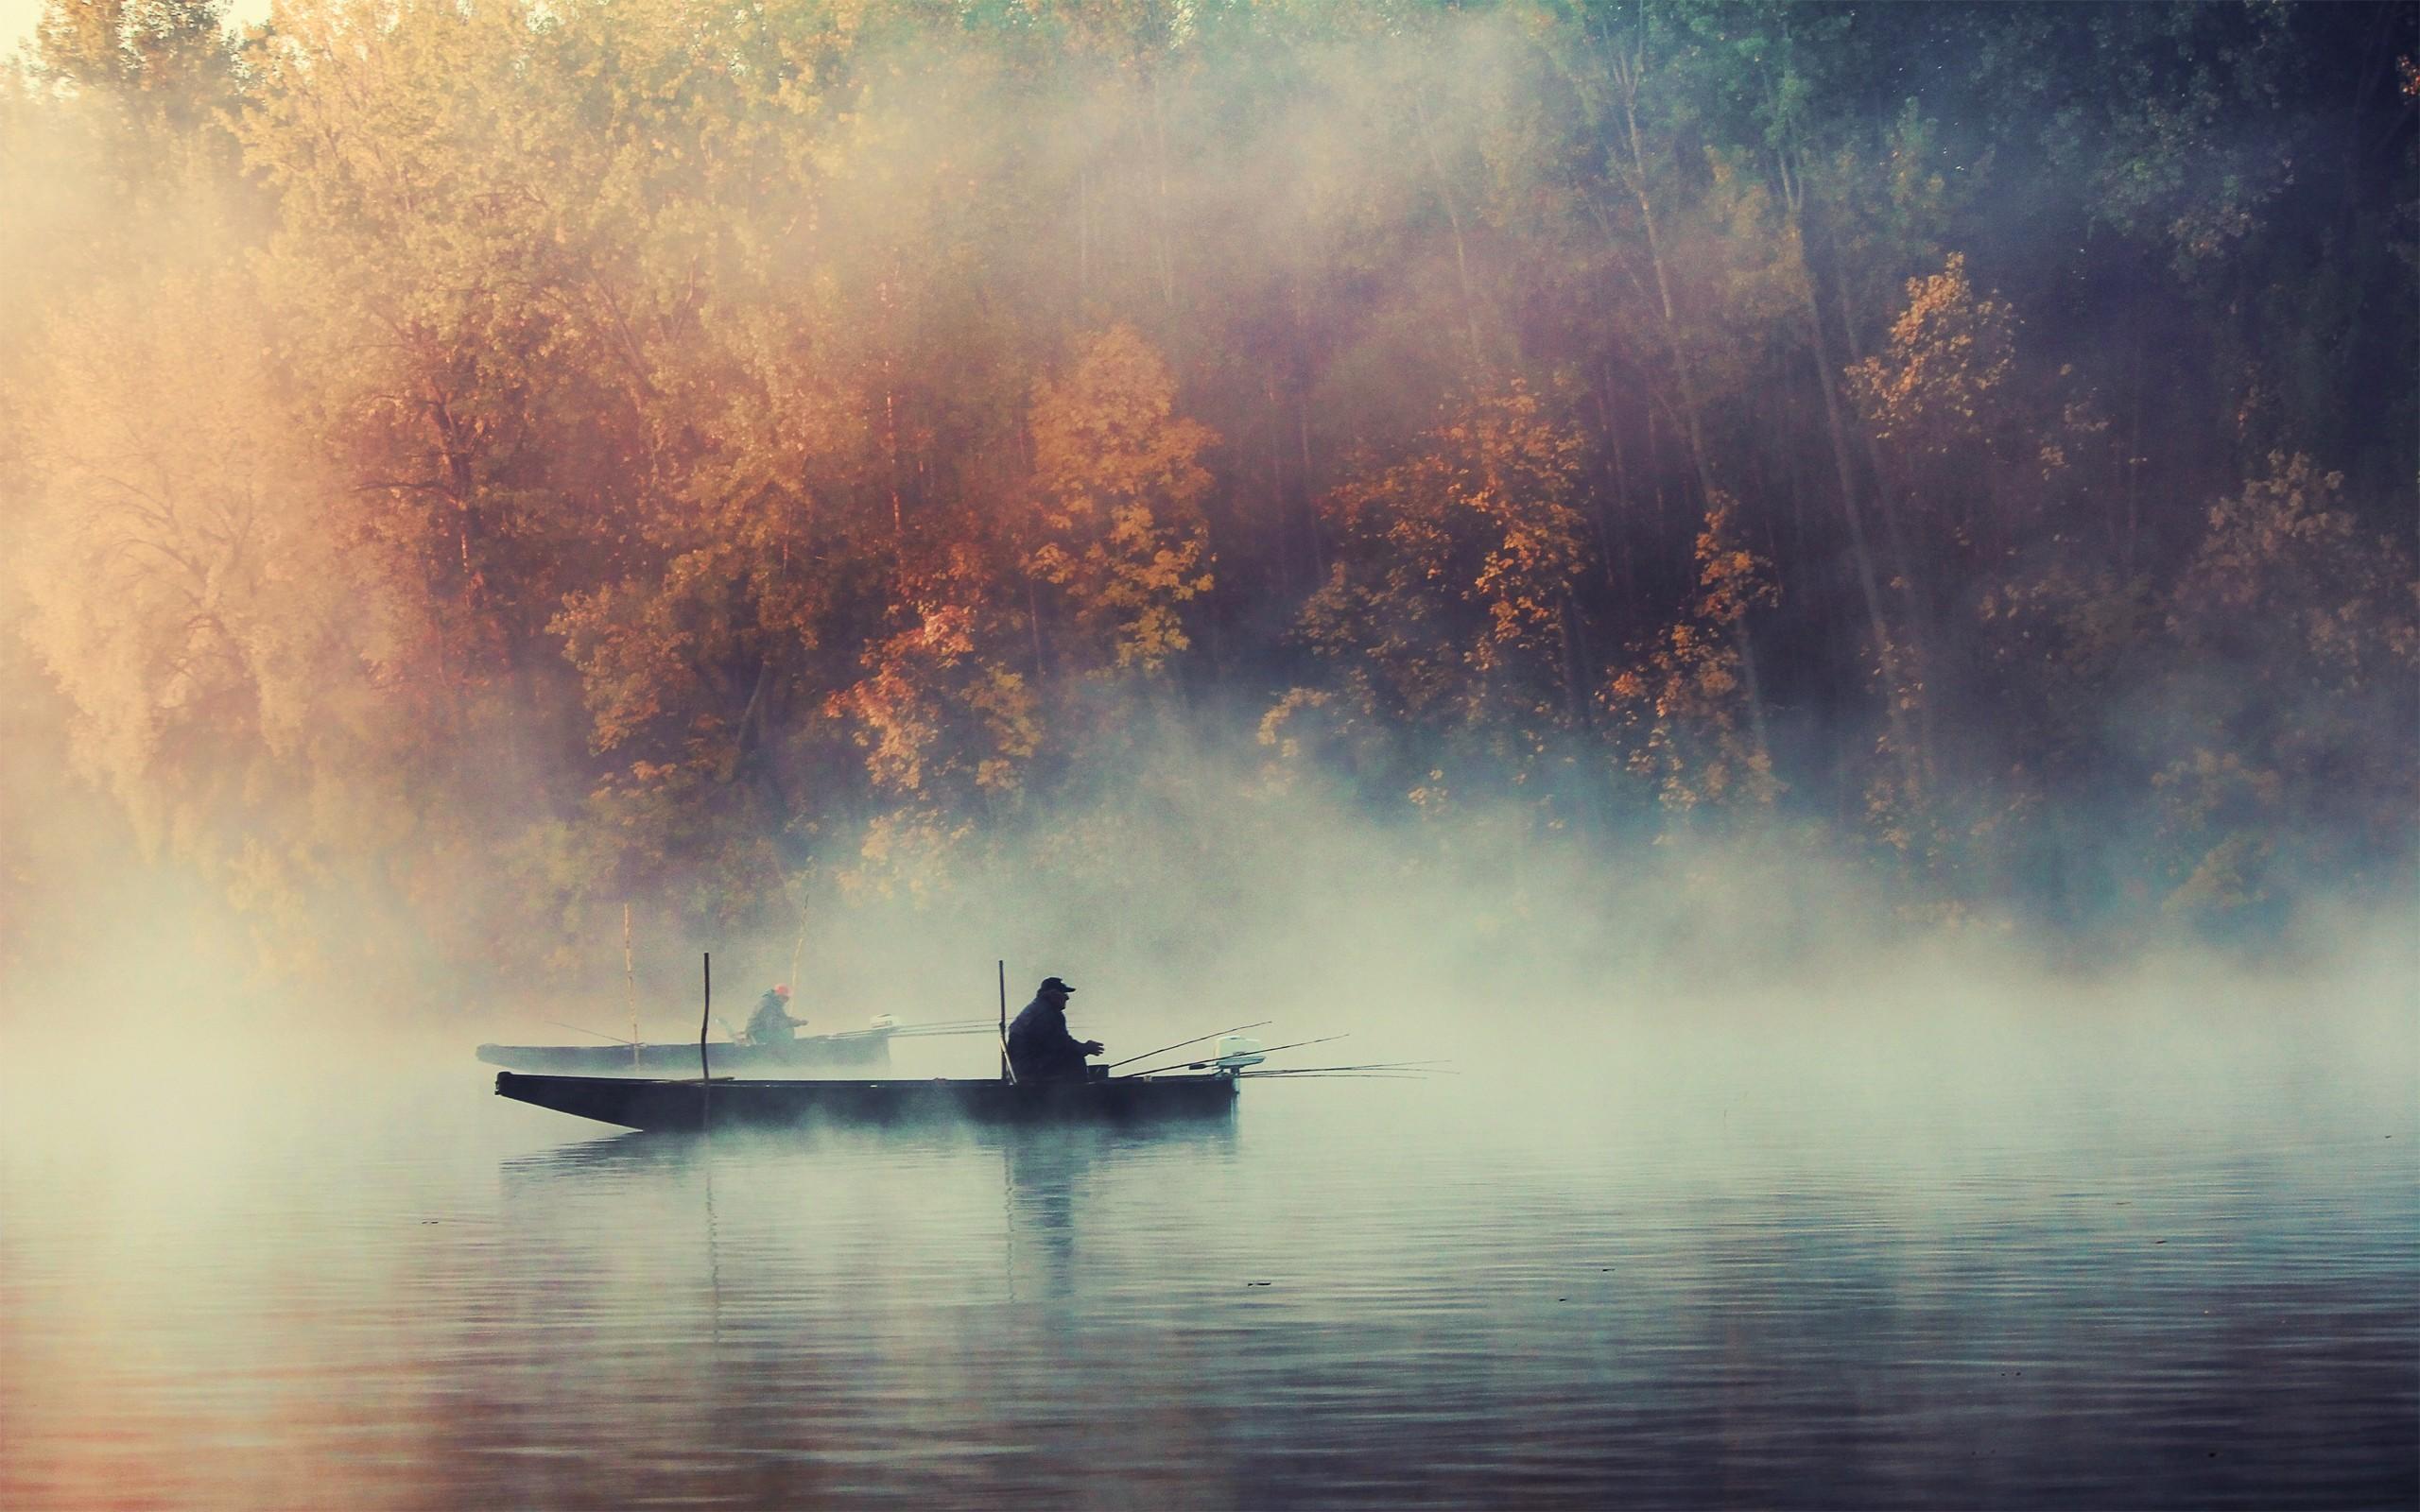 Fisherman Fishing On Lake Wallpaper 1711 Wallpaper Themes 2560x1600